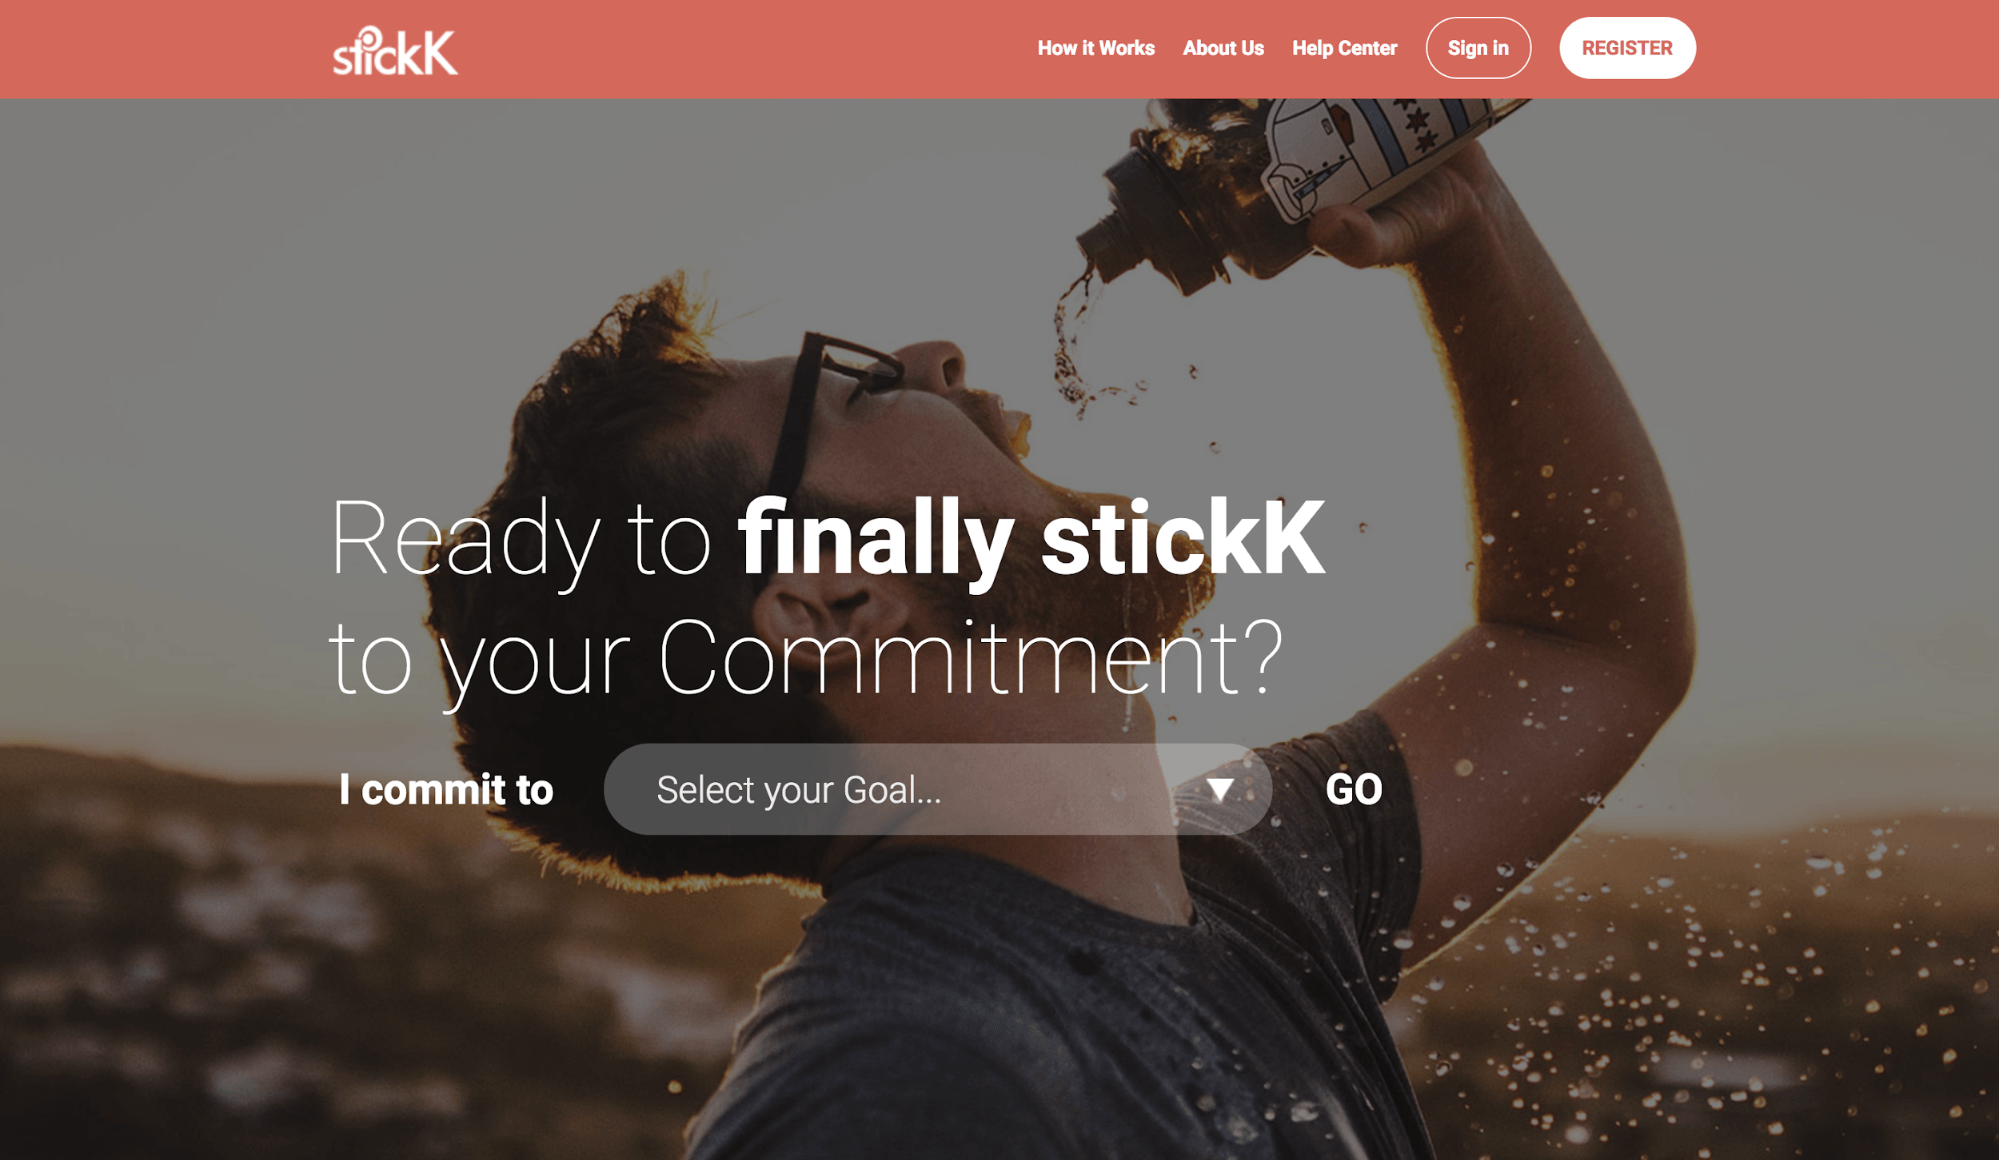 StickK App